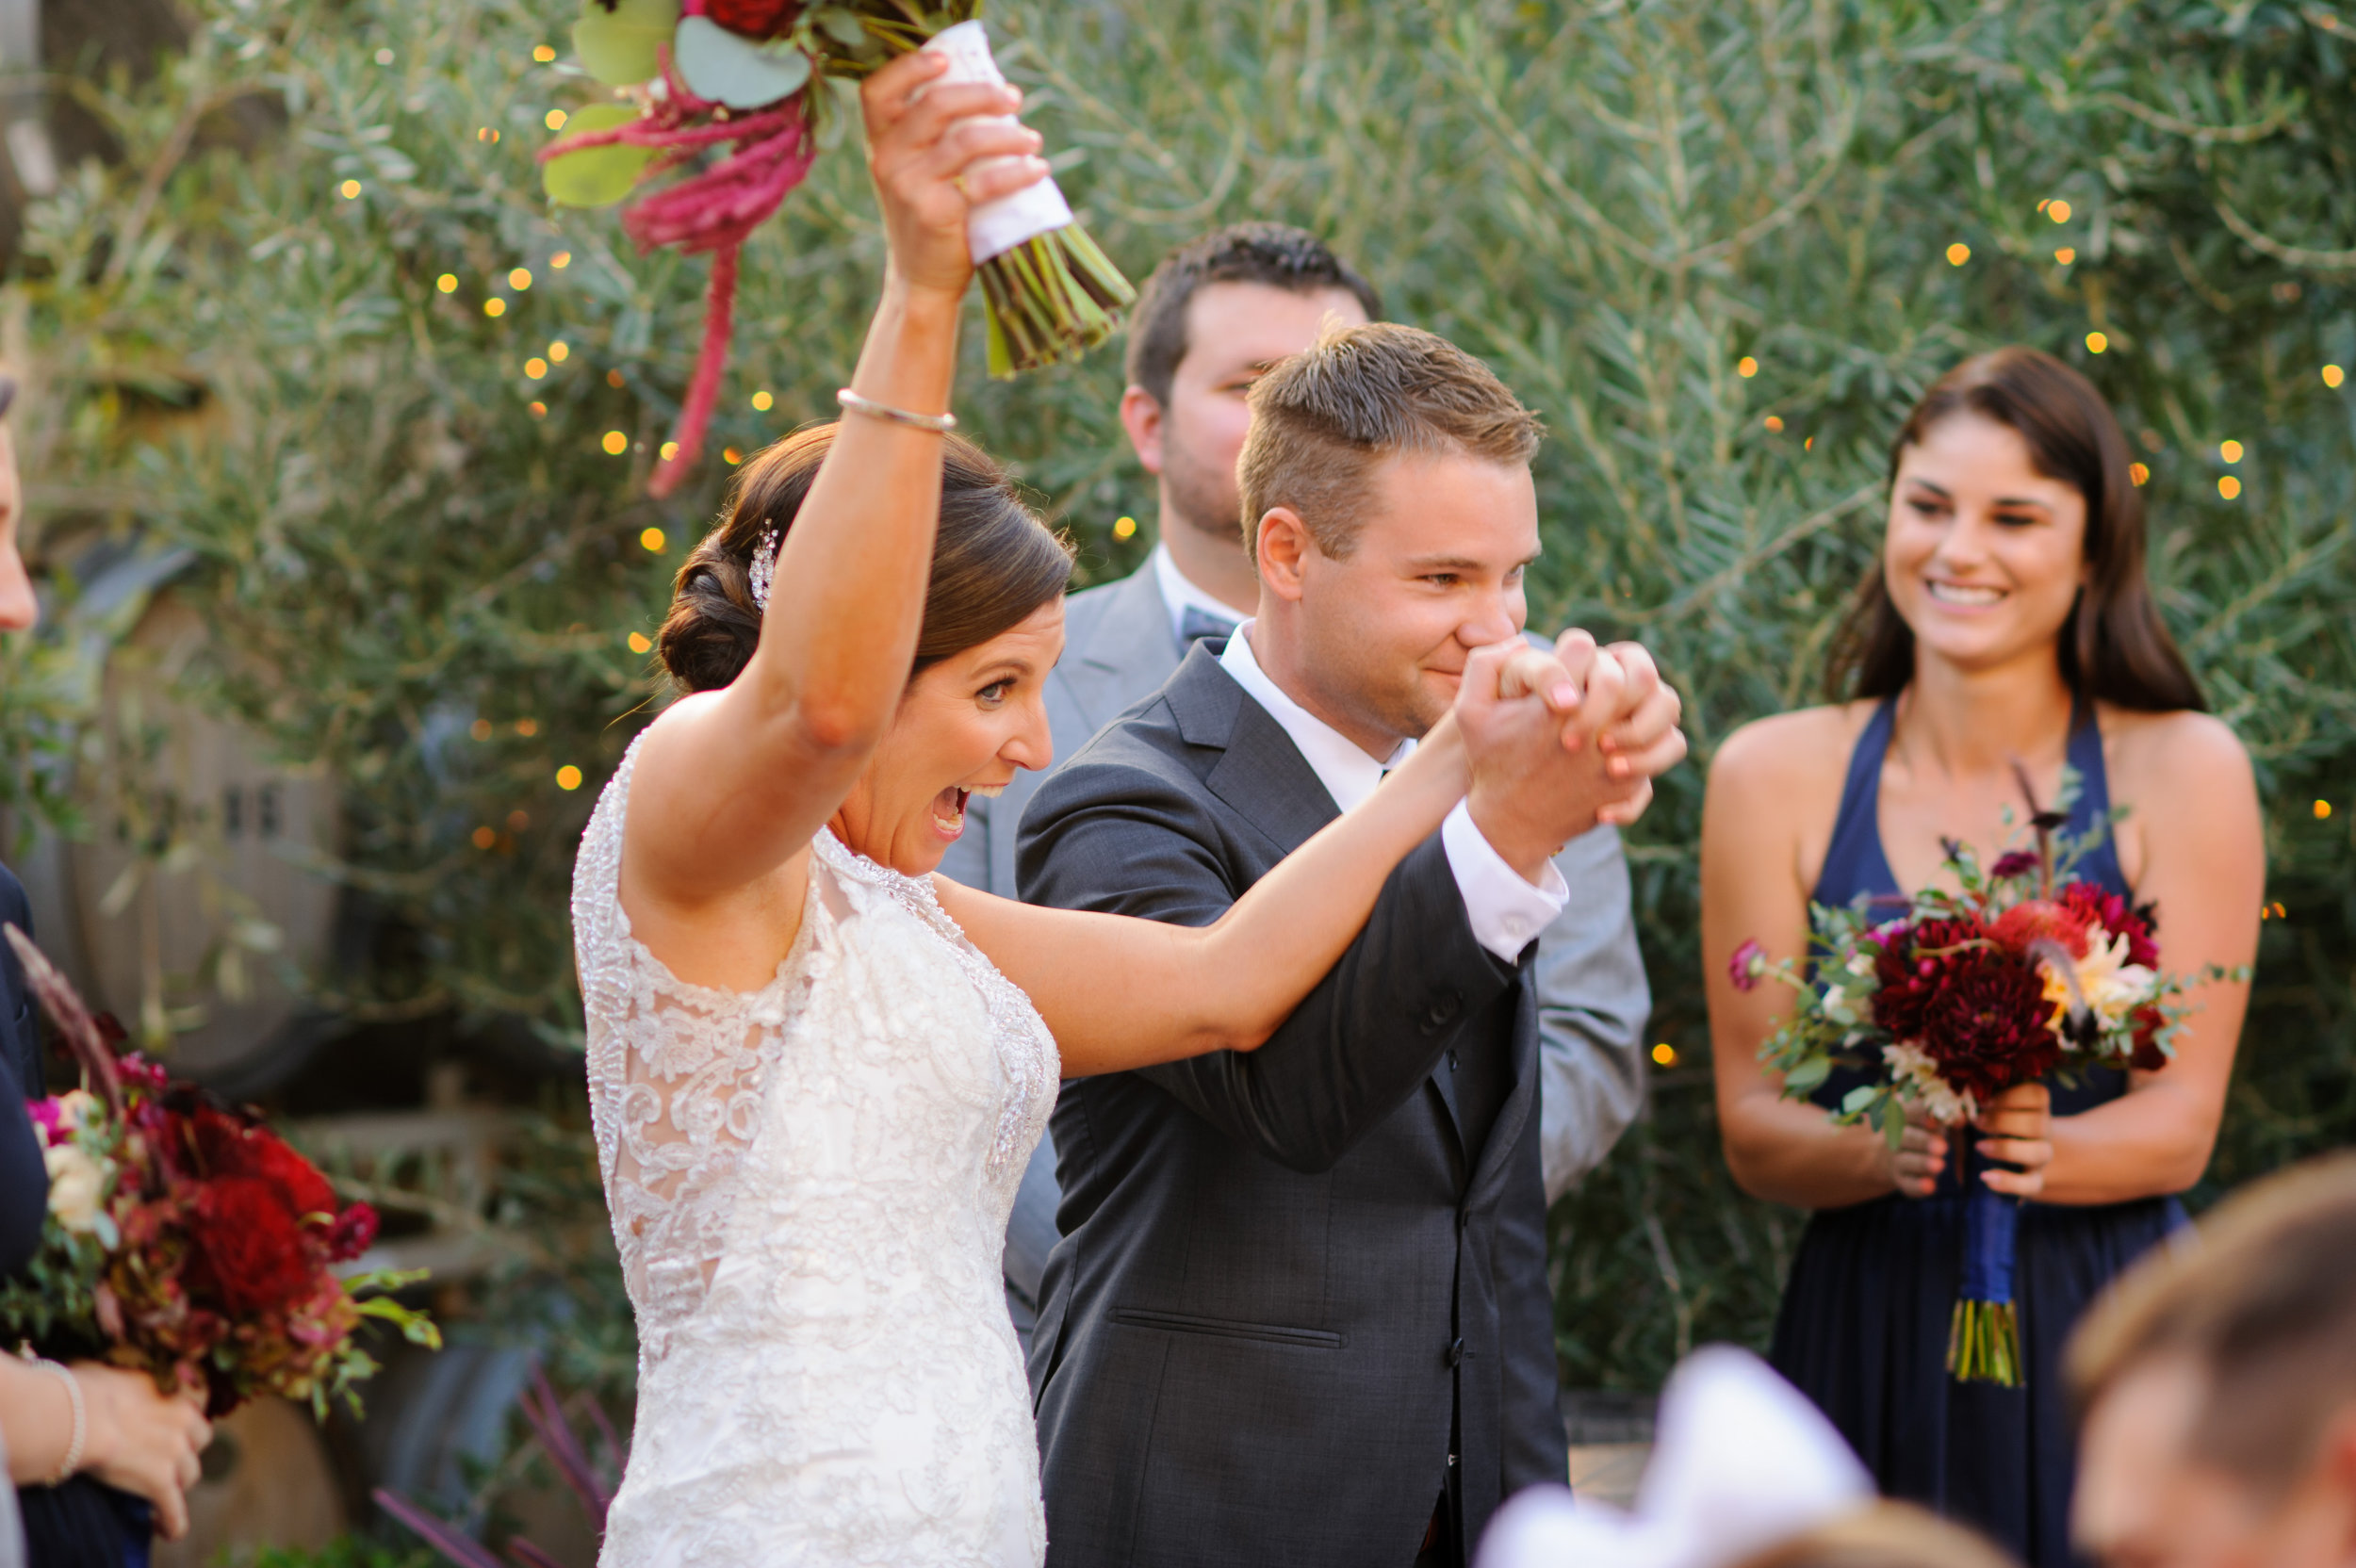 annie-brian-014-antiquite-midtown-sacramento-wedding-photographer-katherine-nicole-photography.JPG